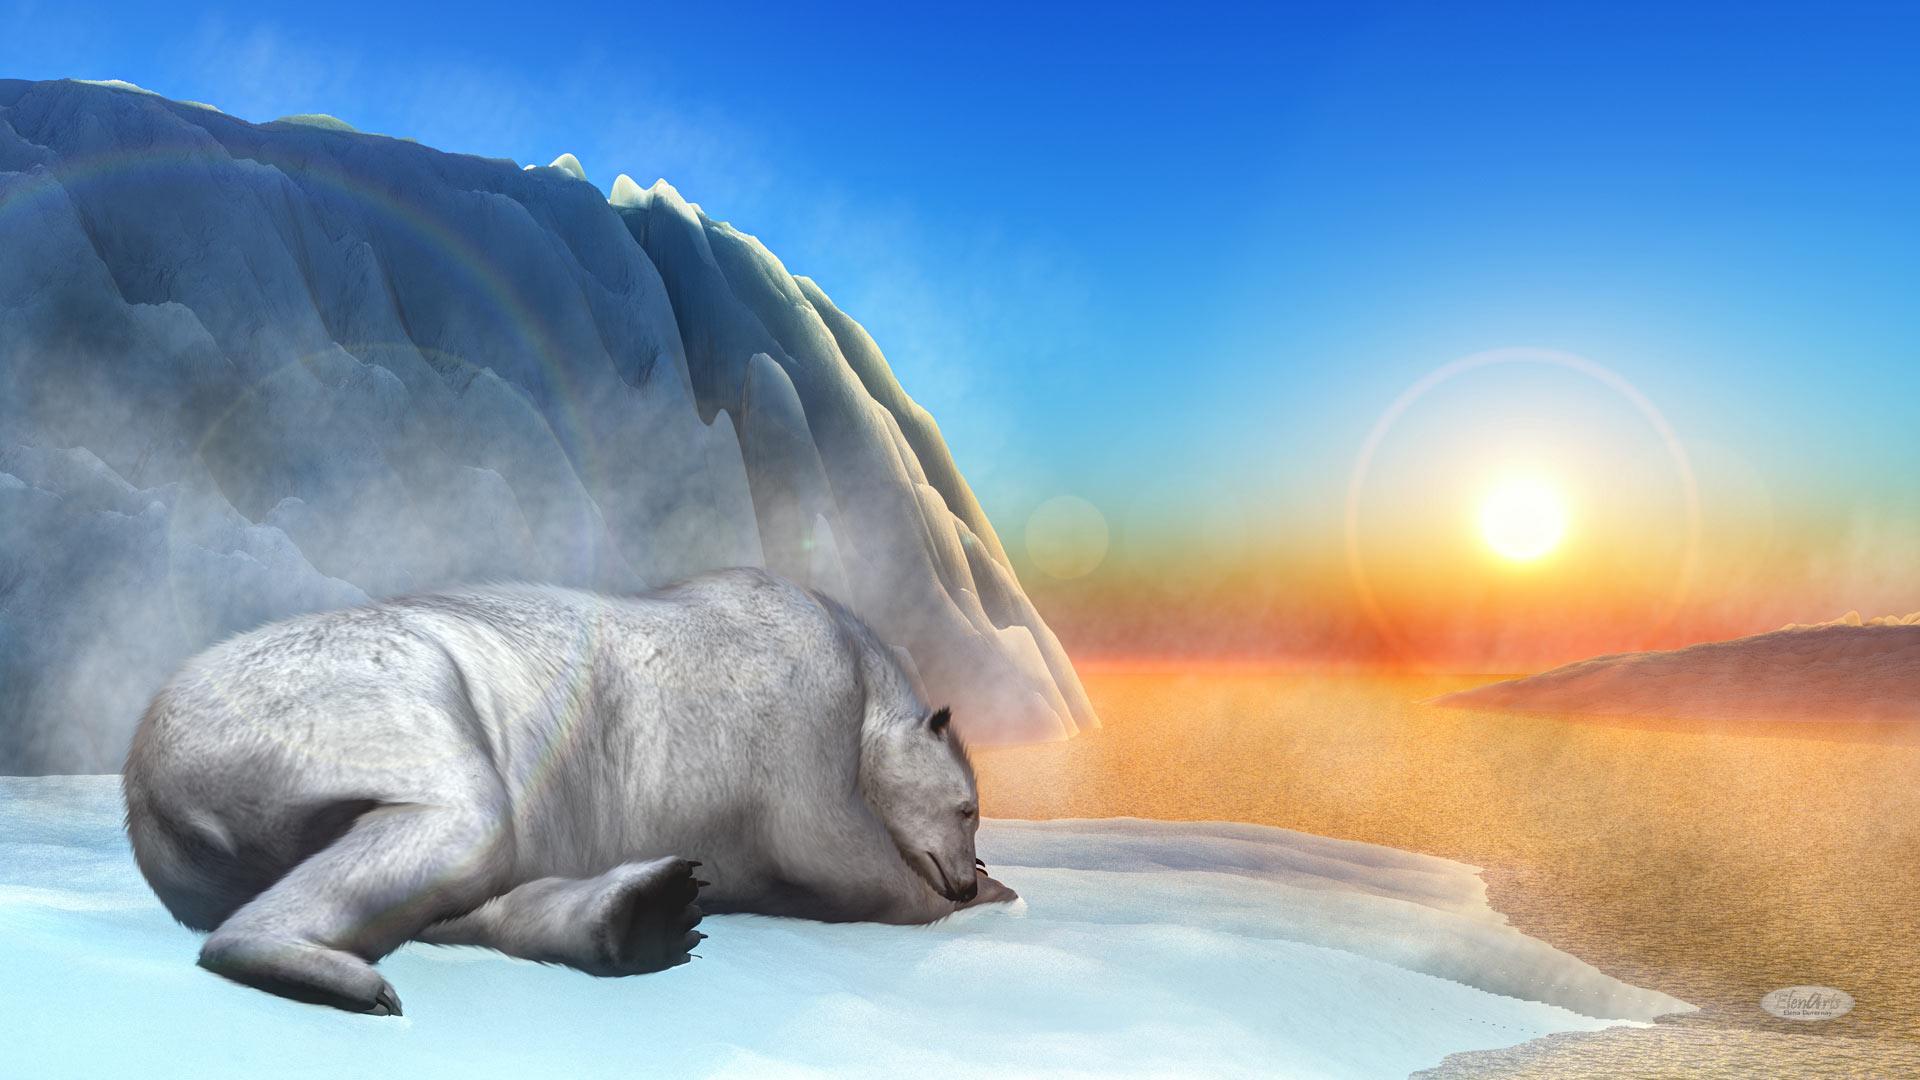 Polar bear sleeping upon an iceberg by sunset – 3D render